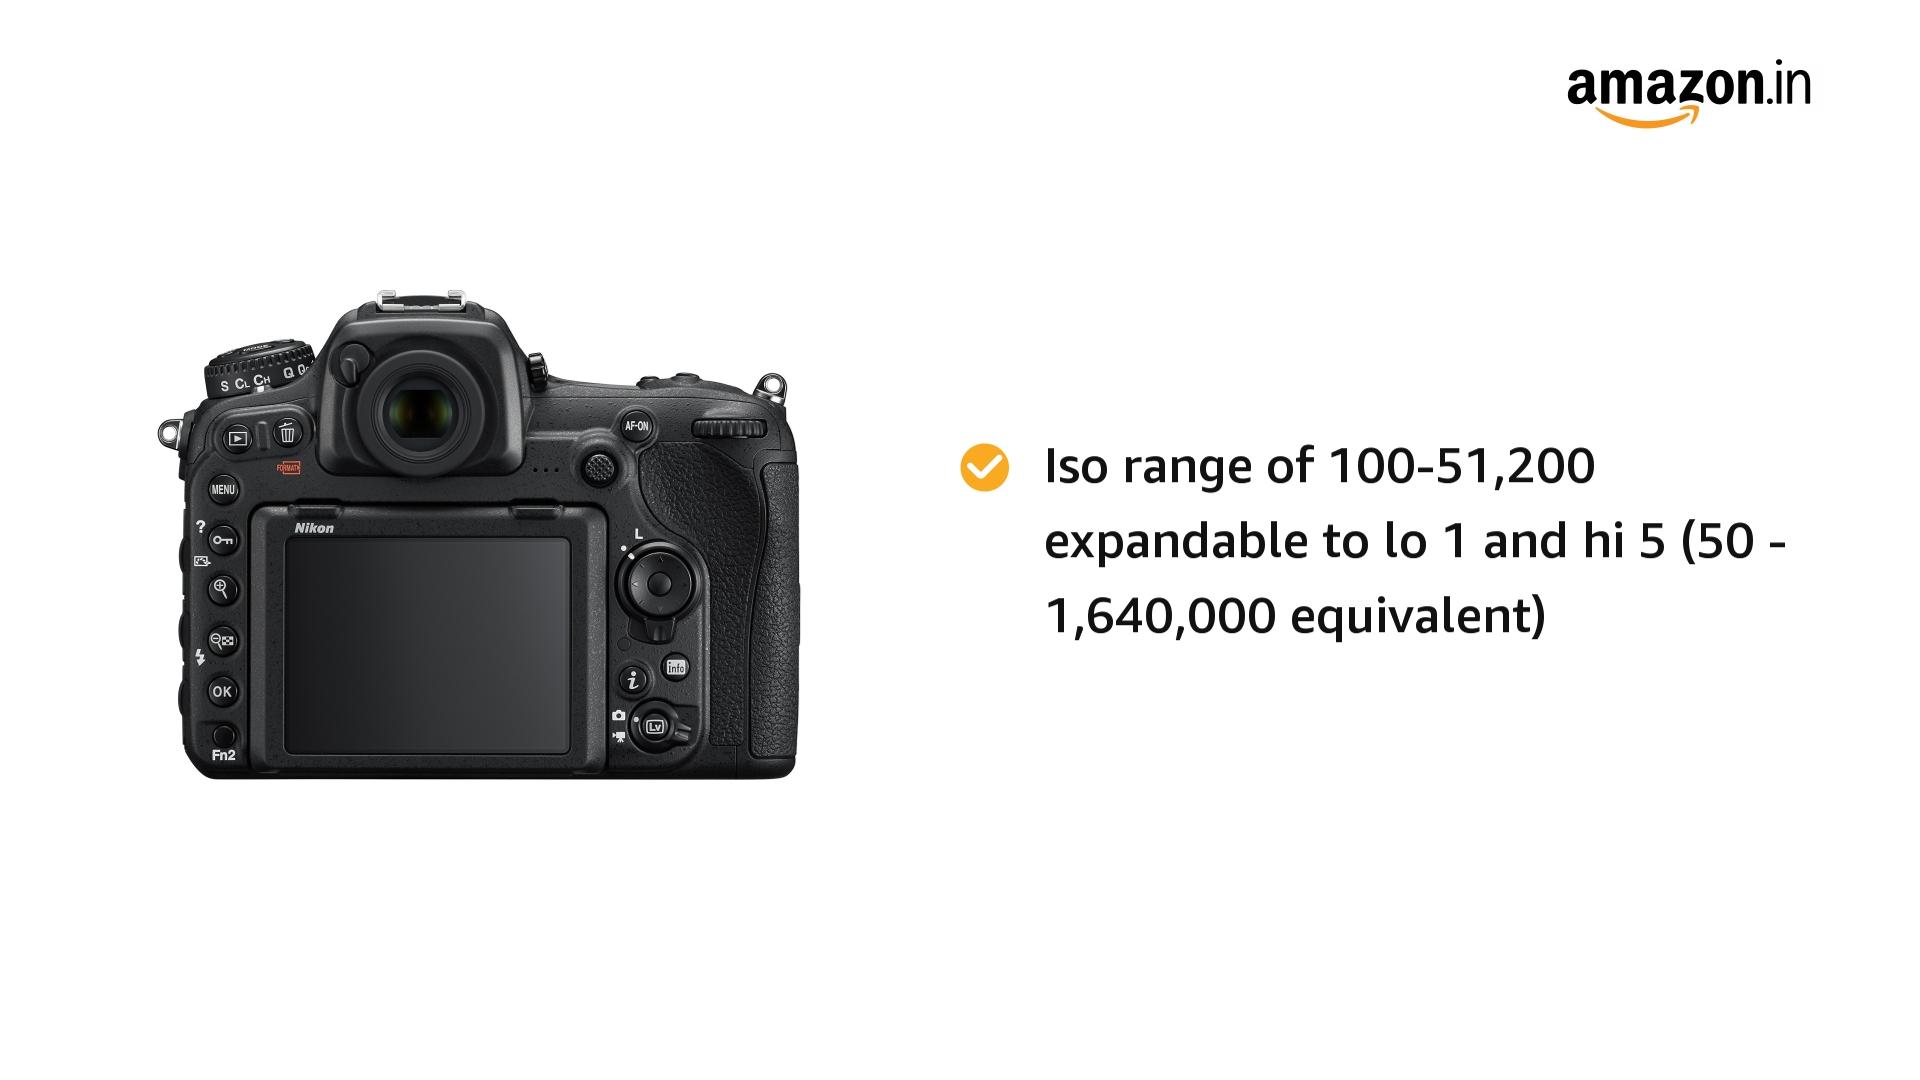 NIKON D 500 Body with 64 GB (Class 10) SD Card